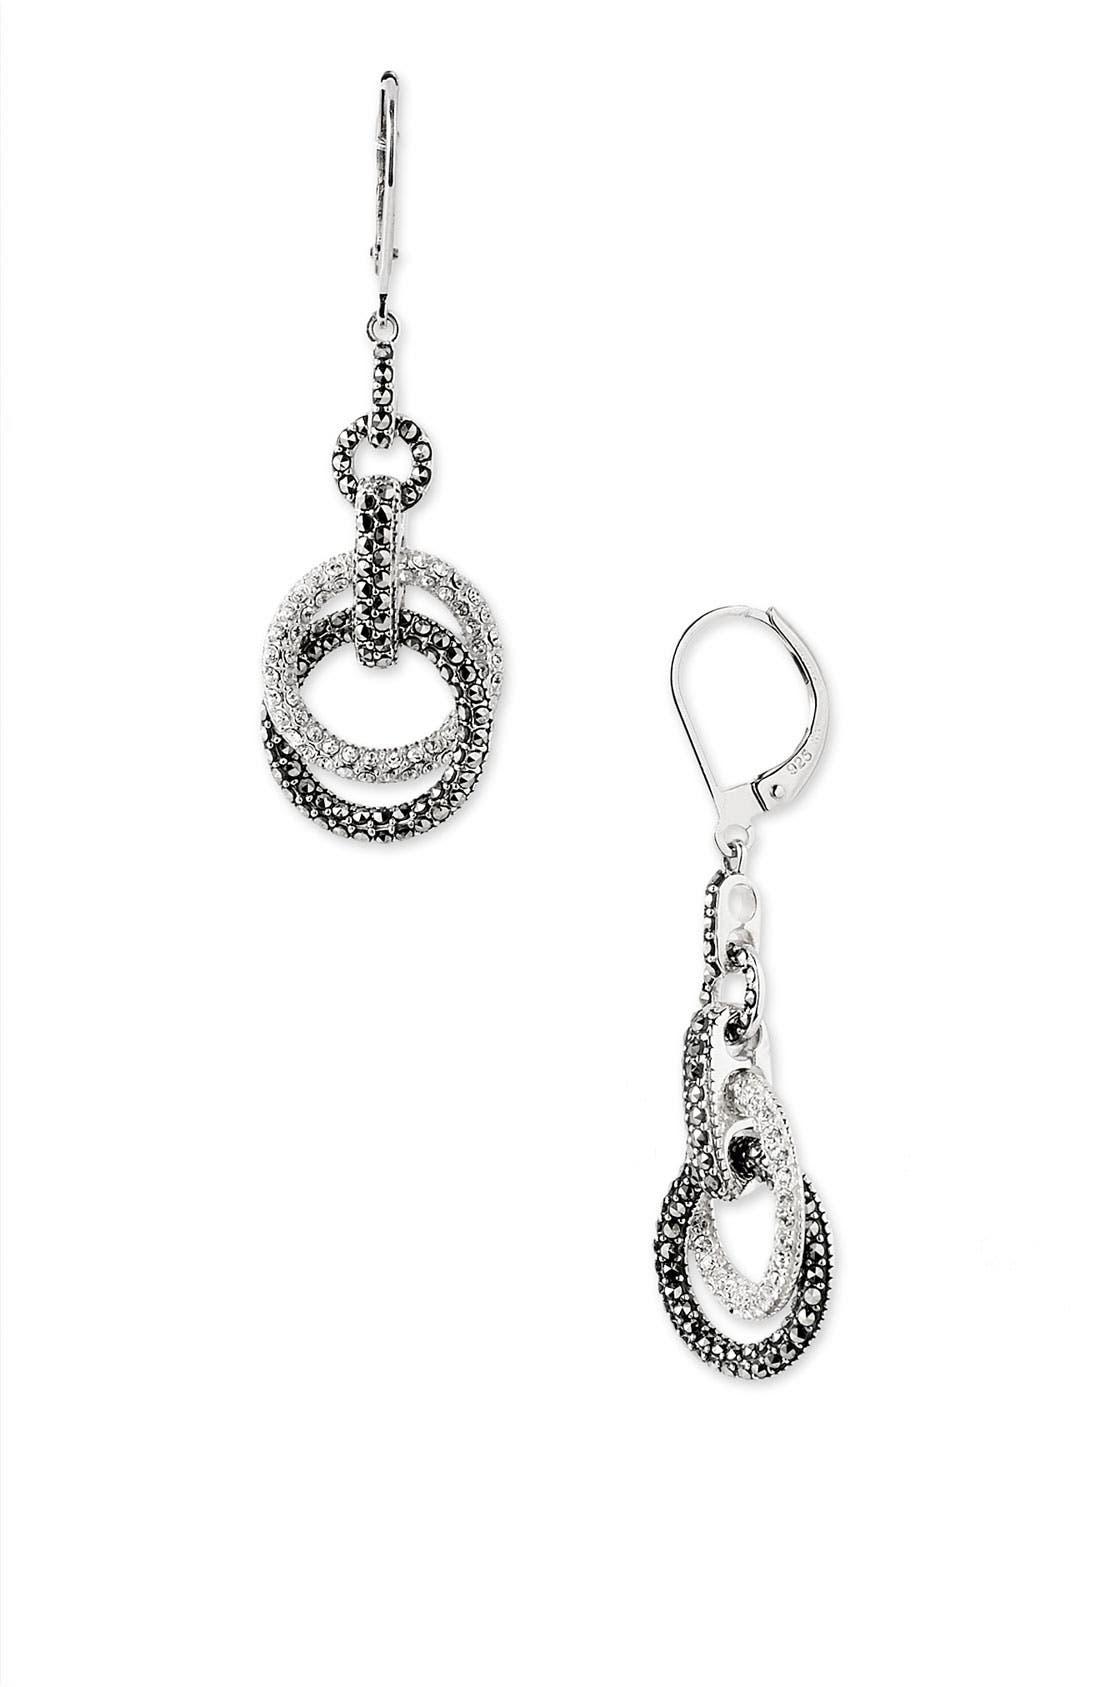 Alternate Image 1 Selected - Judith Jack Double Circle Drop Earrings